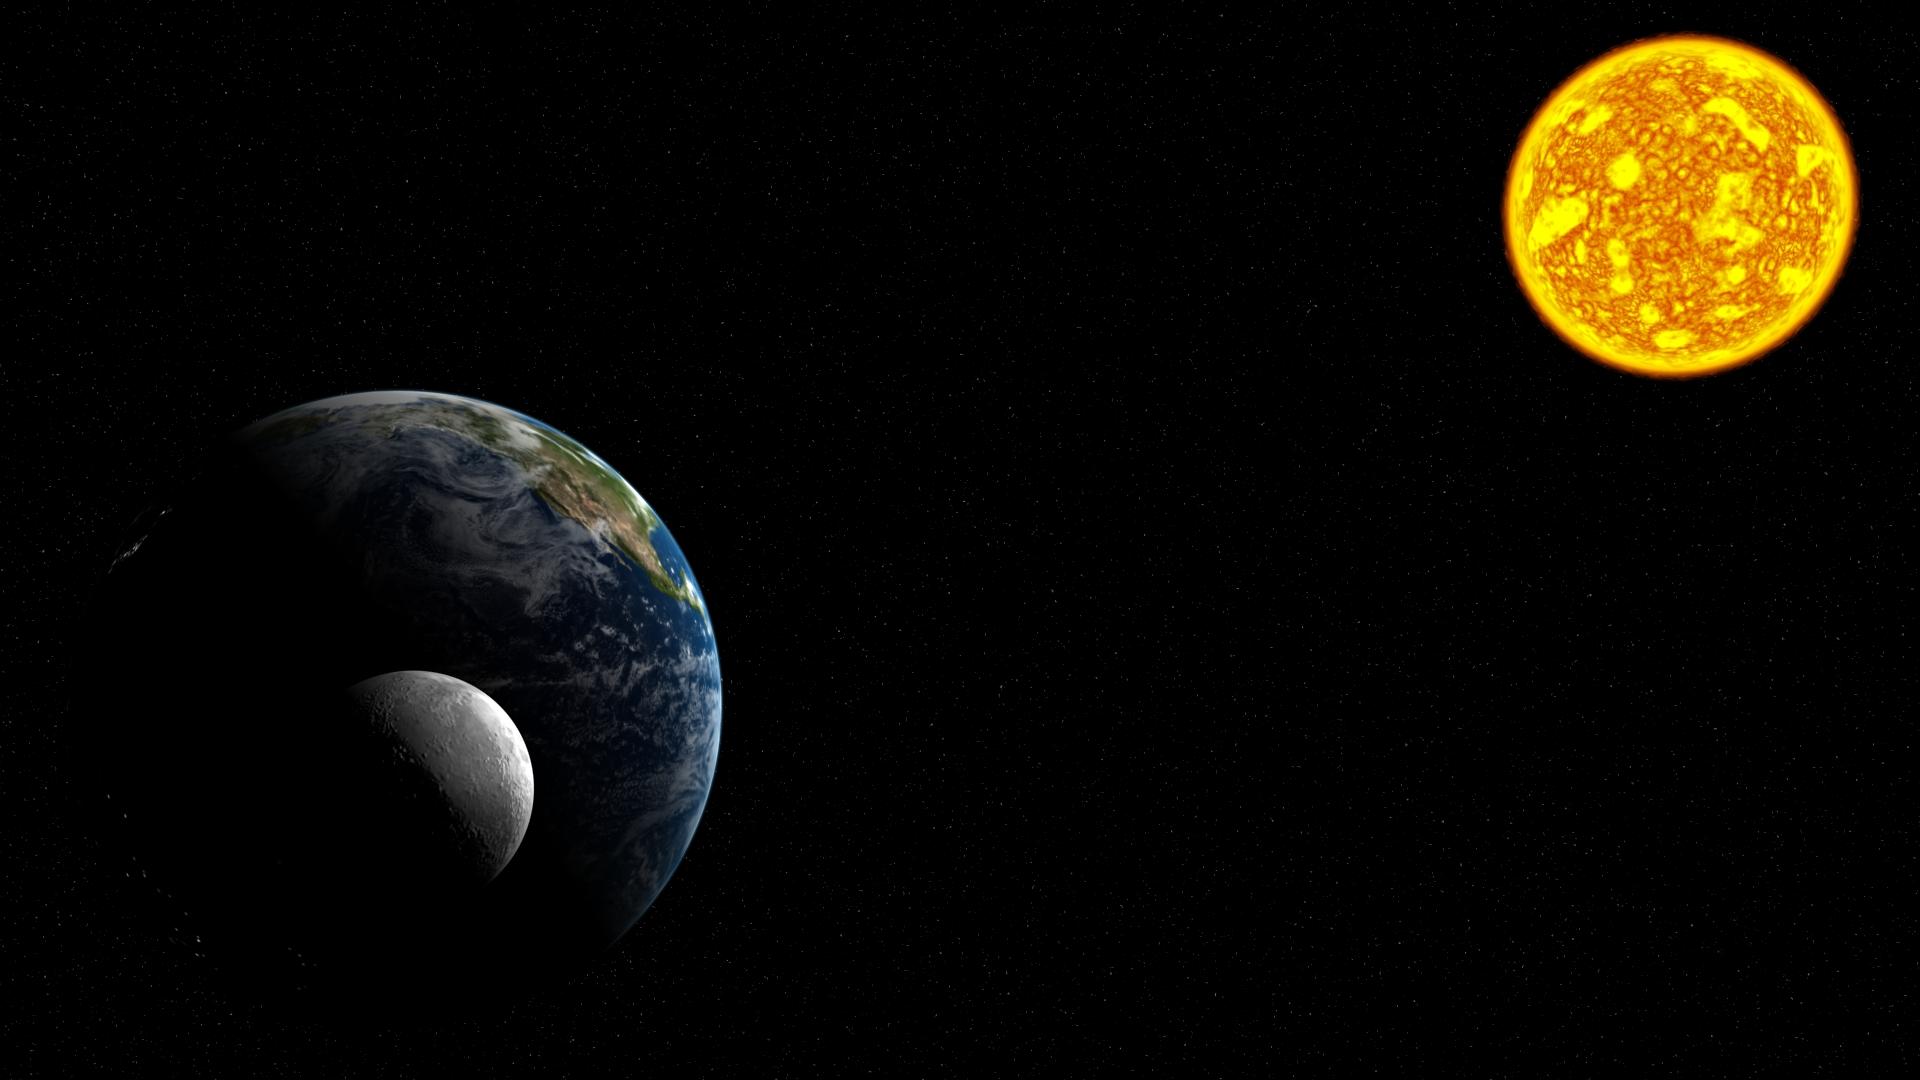 Rotating Earth Wallpaper HD 1920x1080 5155 1920x1080